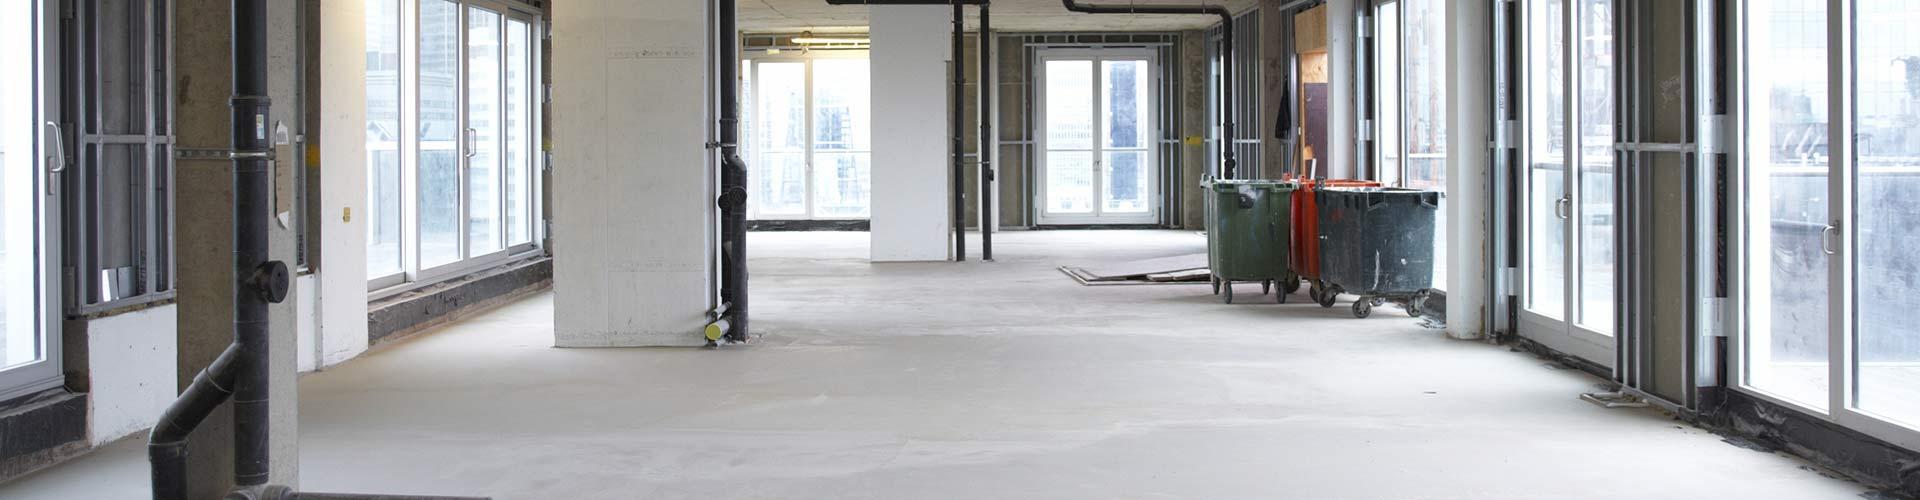 concrete-in-building